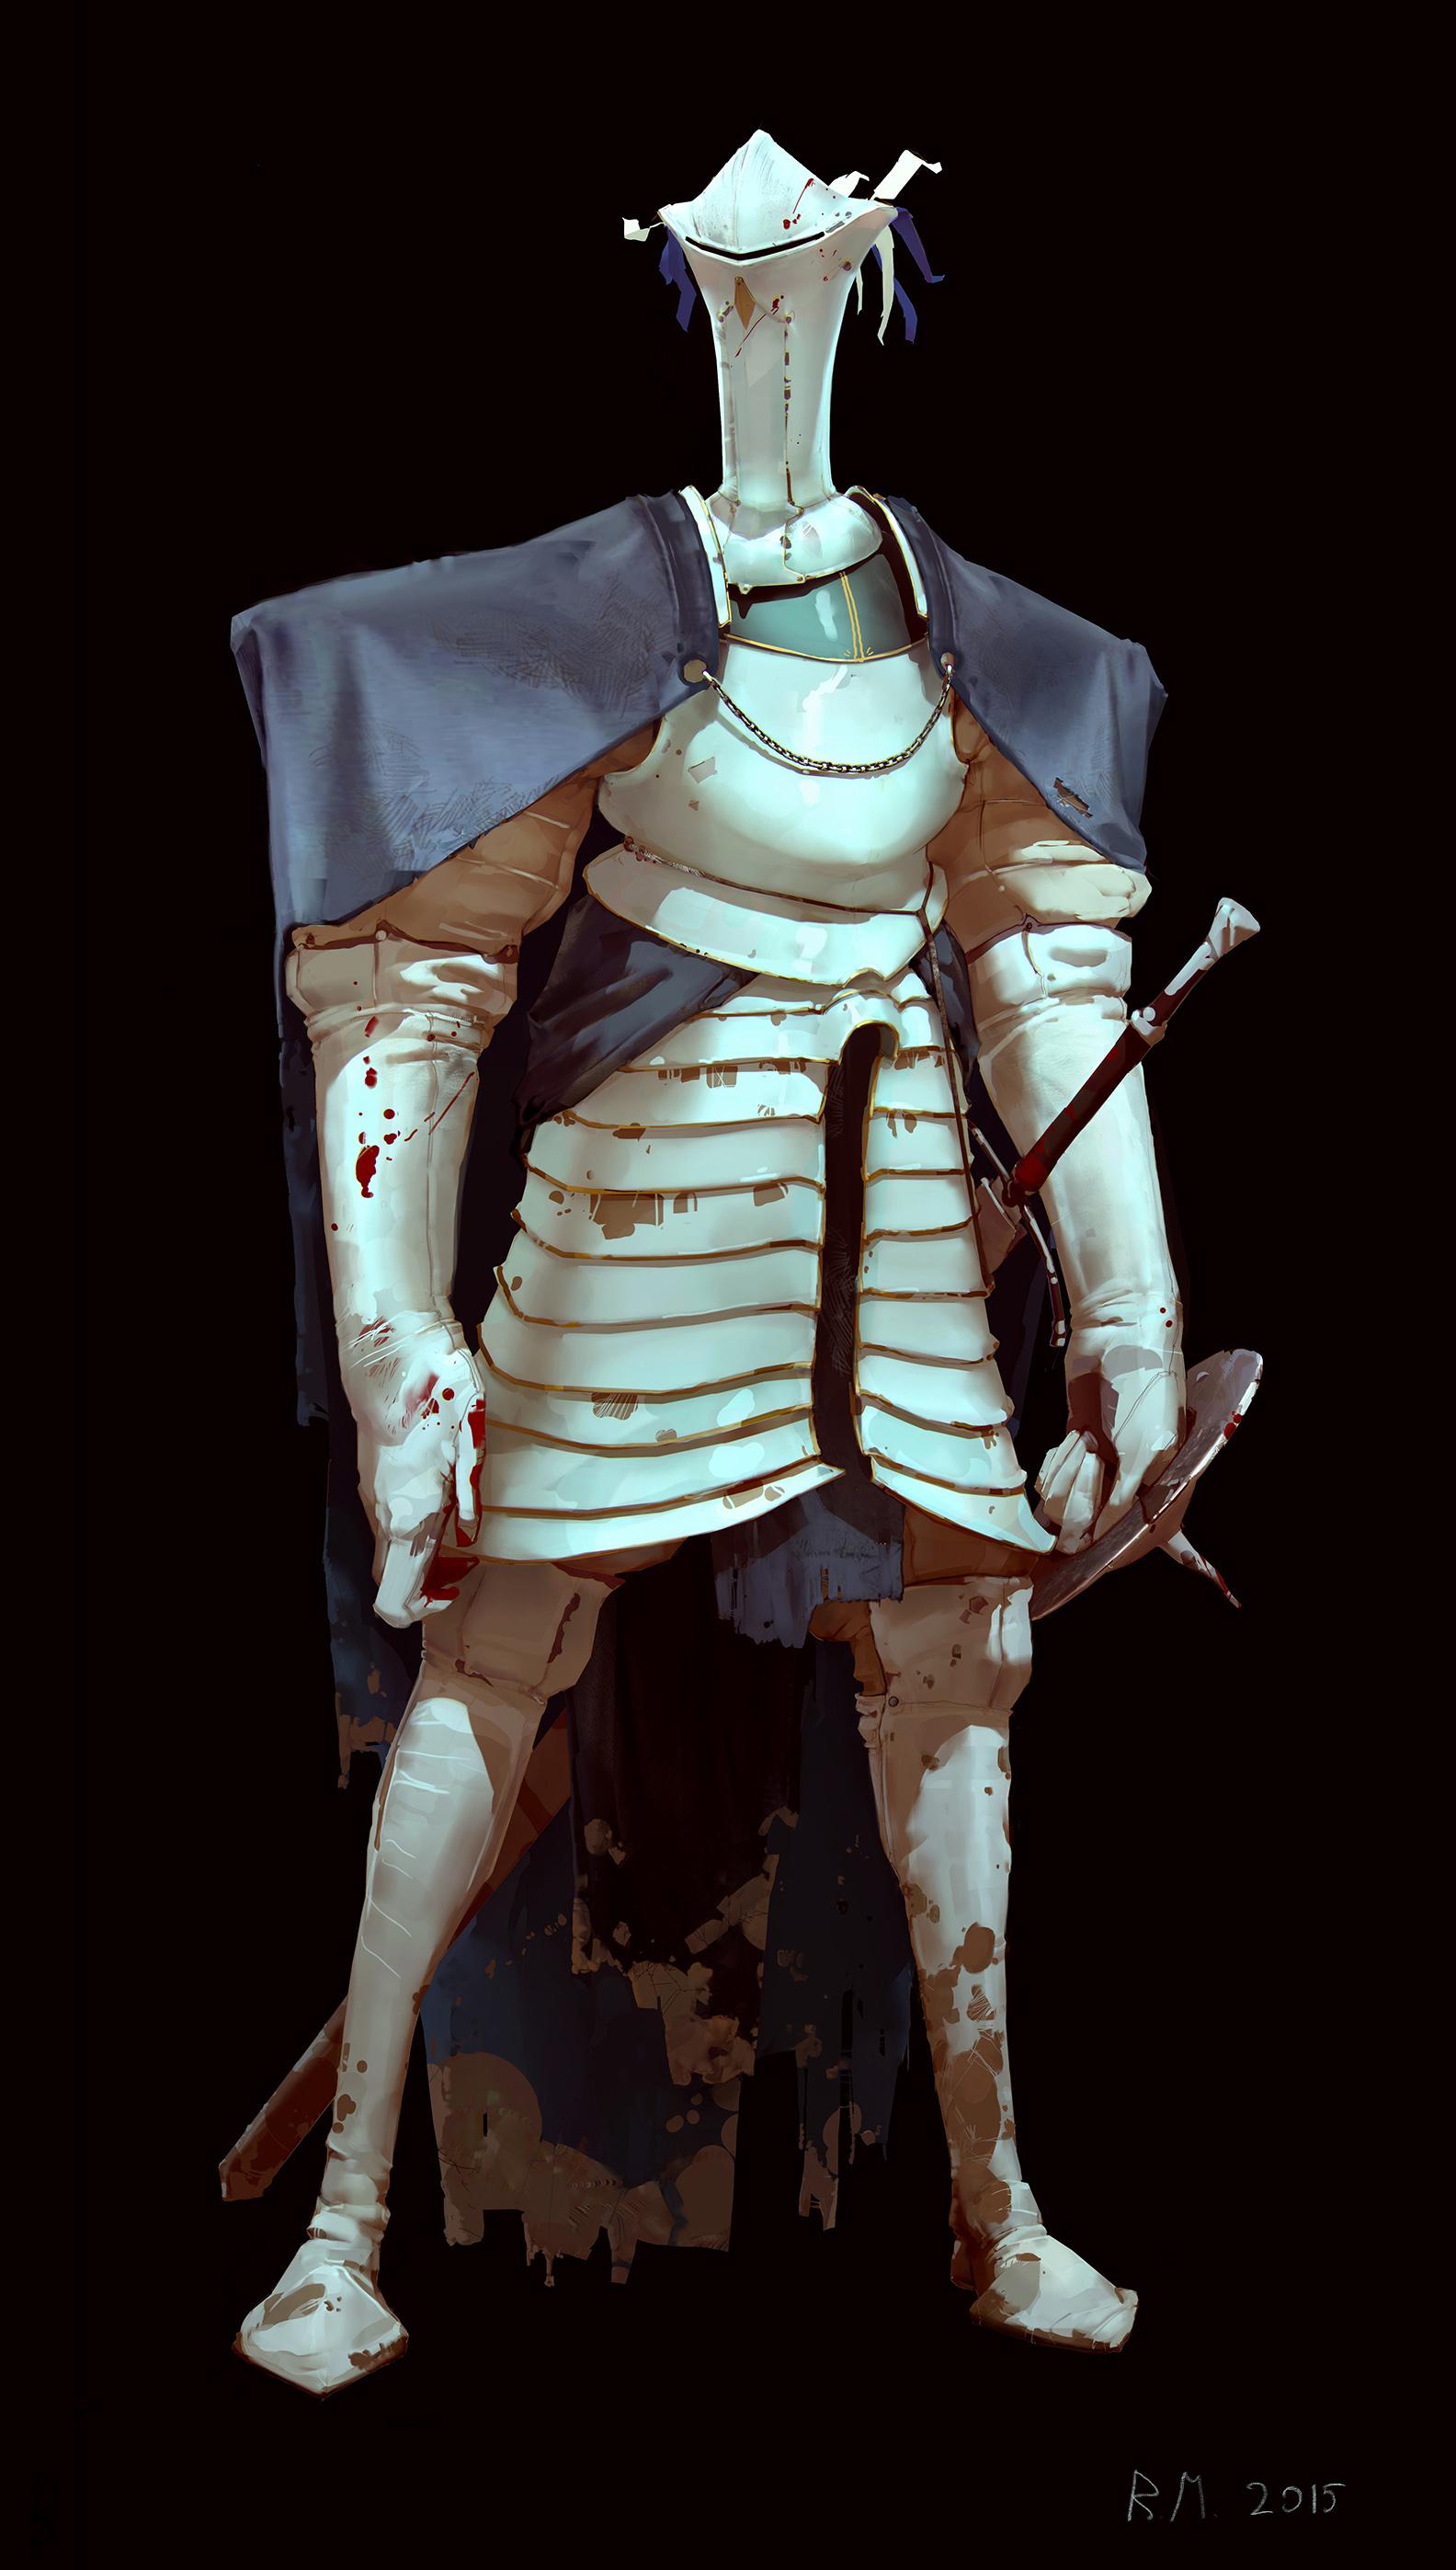 White knight by Rahmatozz on DeviantArt